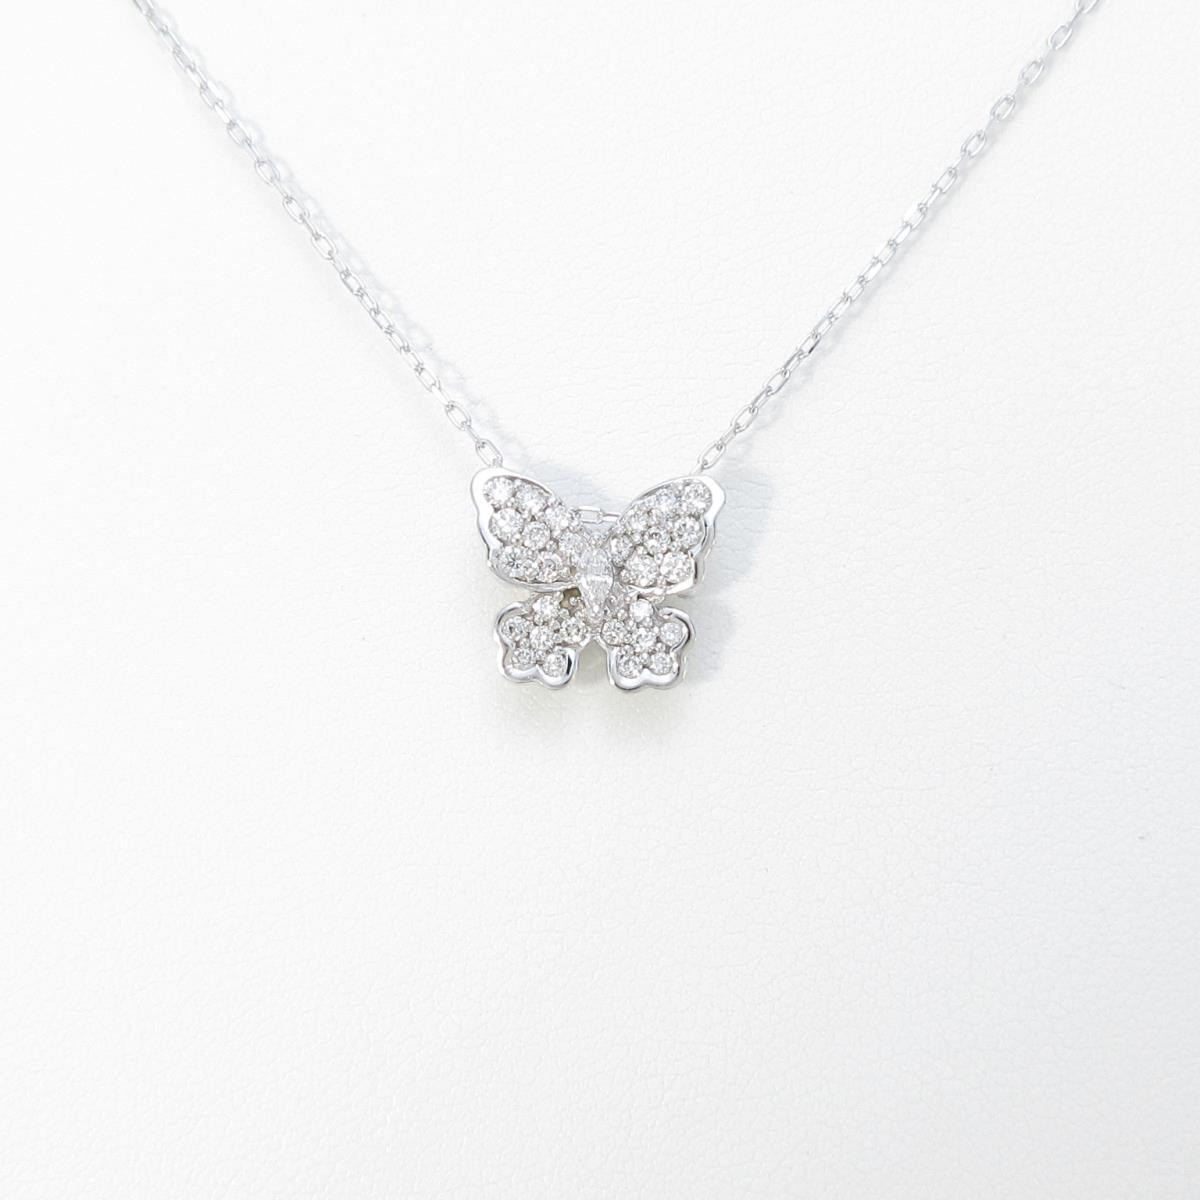 K18WG バタフライ ダイヤモンドネックレス【中古】